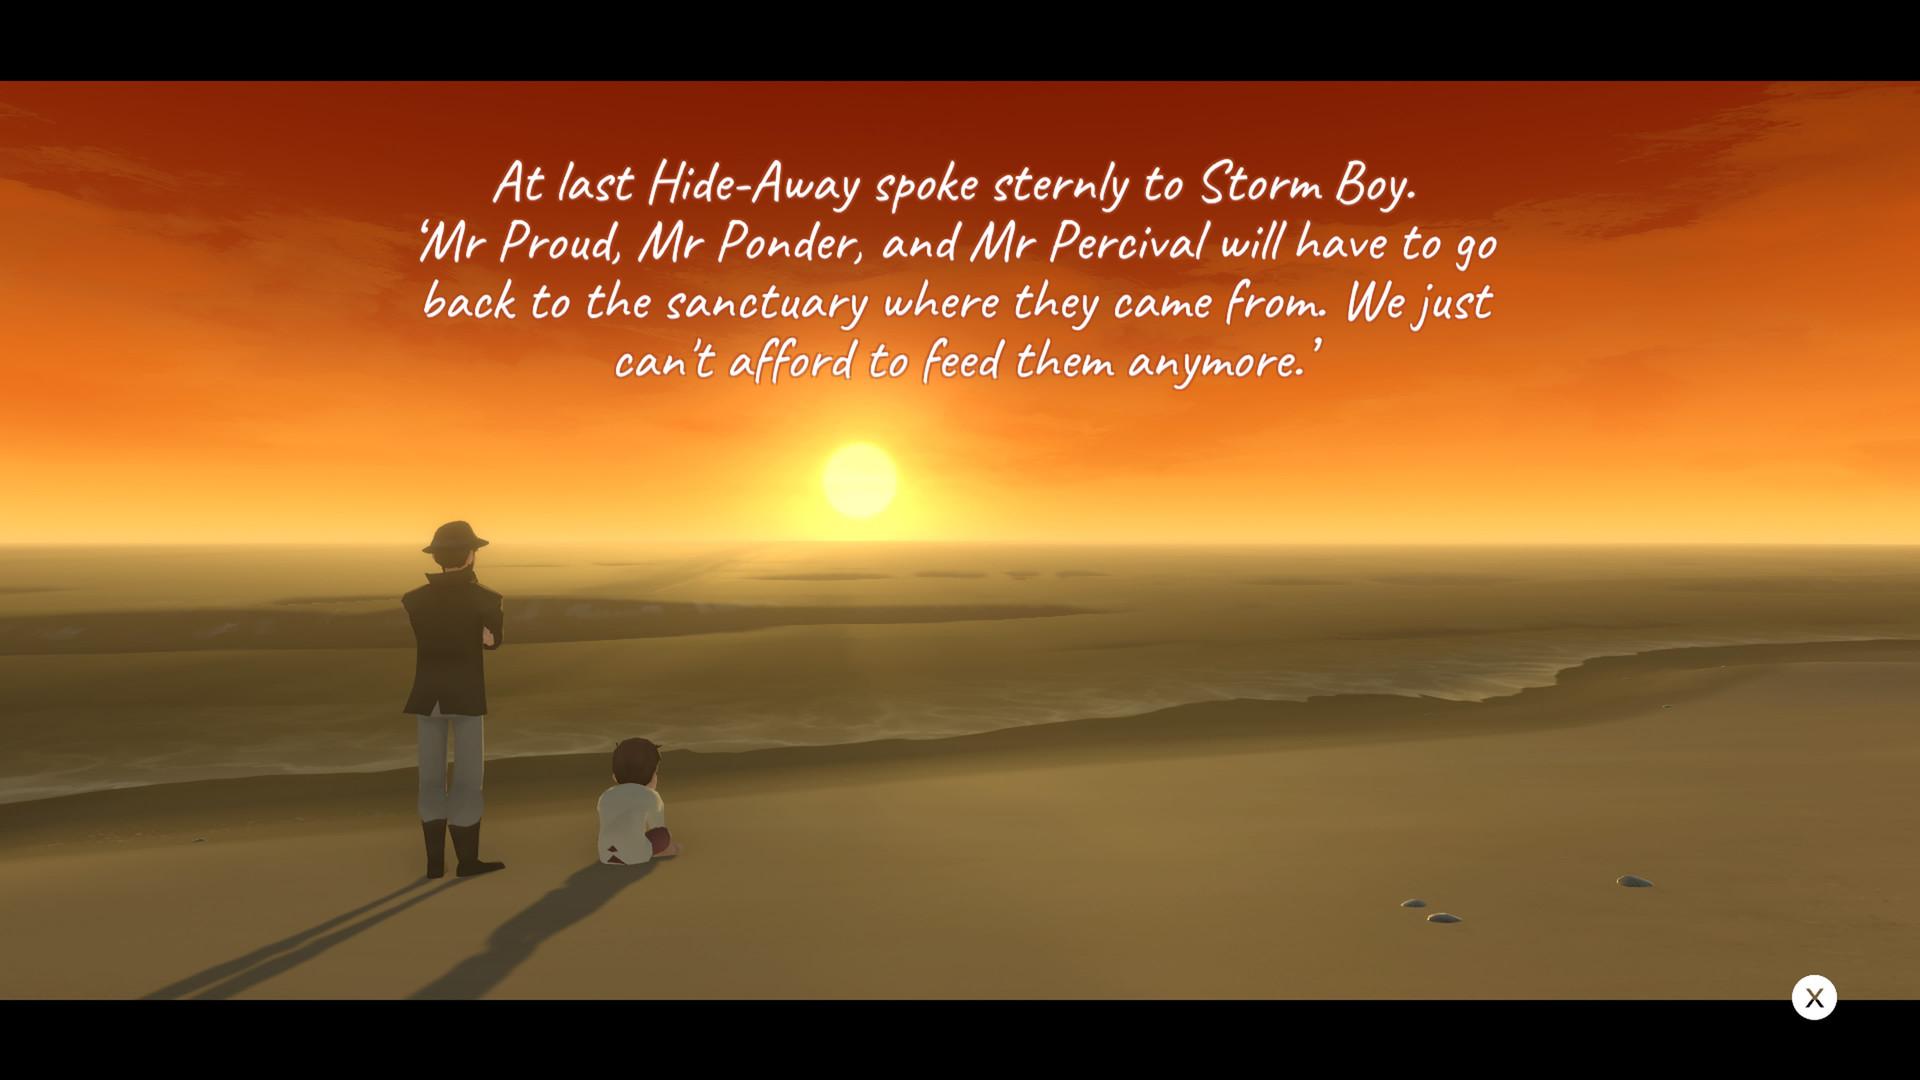 Storm Boy_20210116005954.jpg